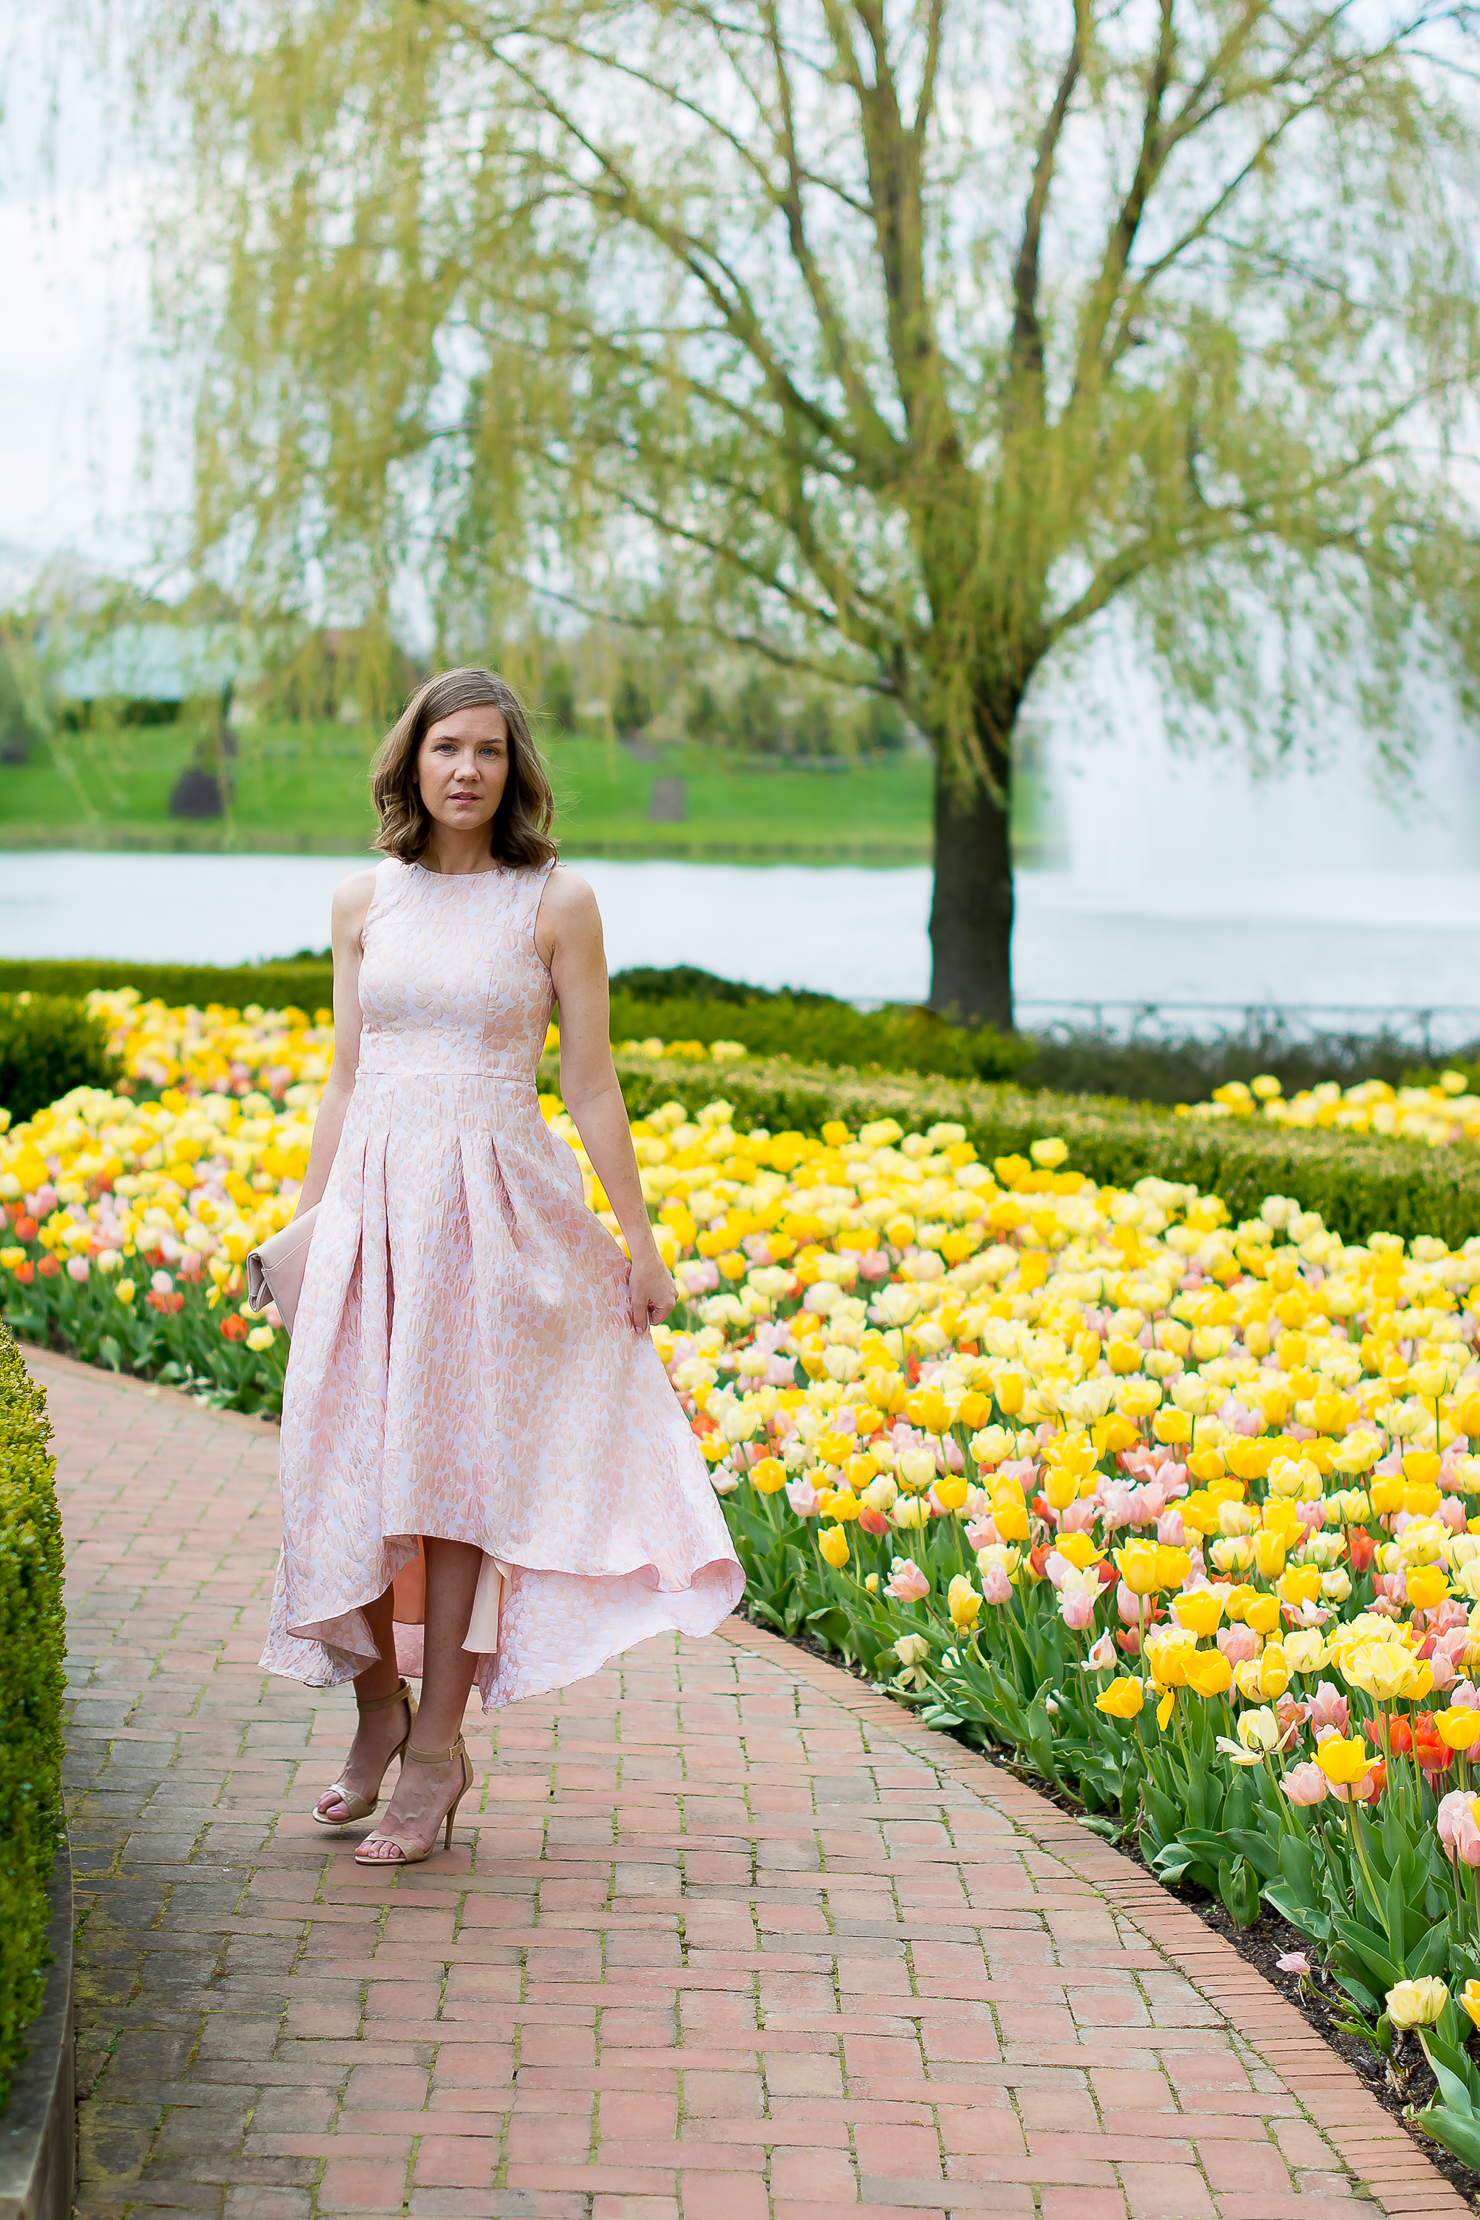 shoshana-coraline-dress-rent-the-runway-blush-folodover-clutch-chicago-botanic-gardens-oscar-de-la-renta-floral-ring-tulips